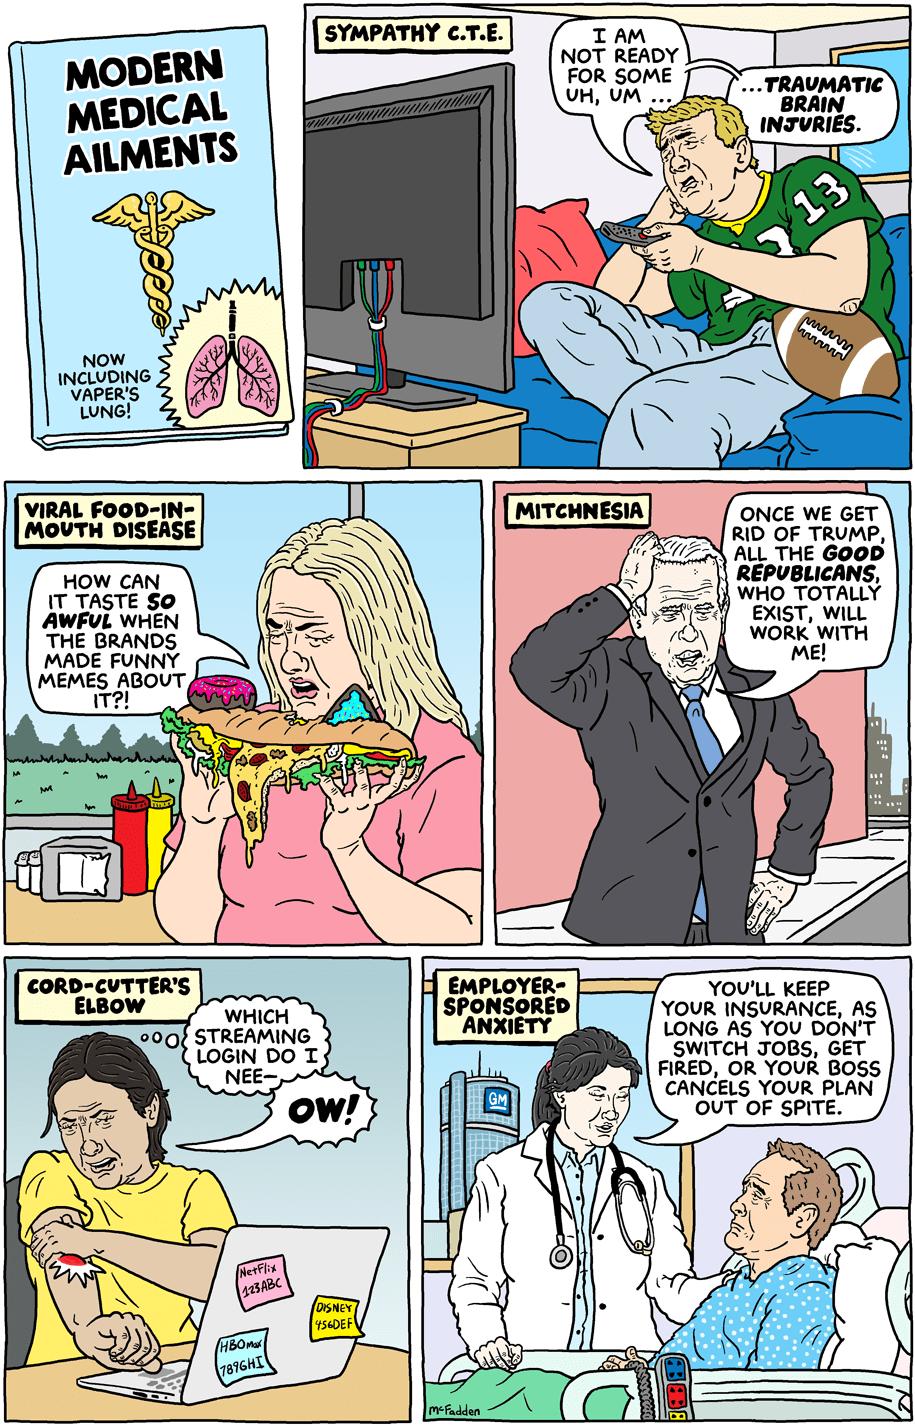 Cartoon: Modern medical ailments